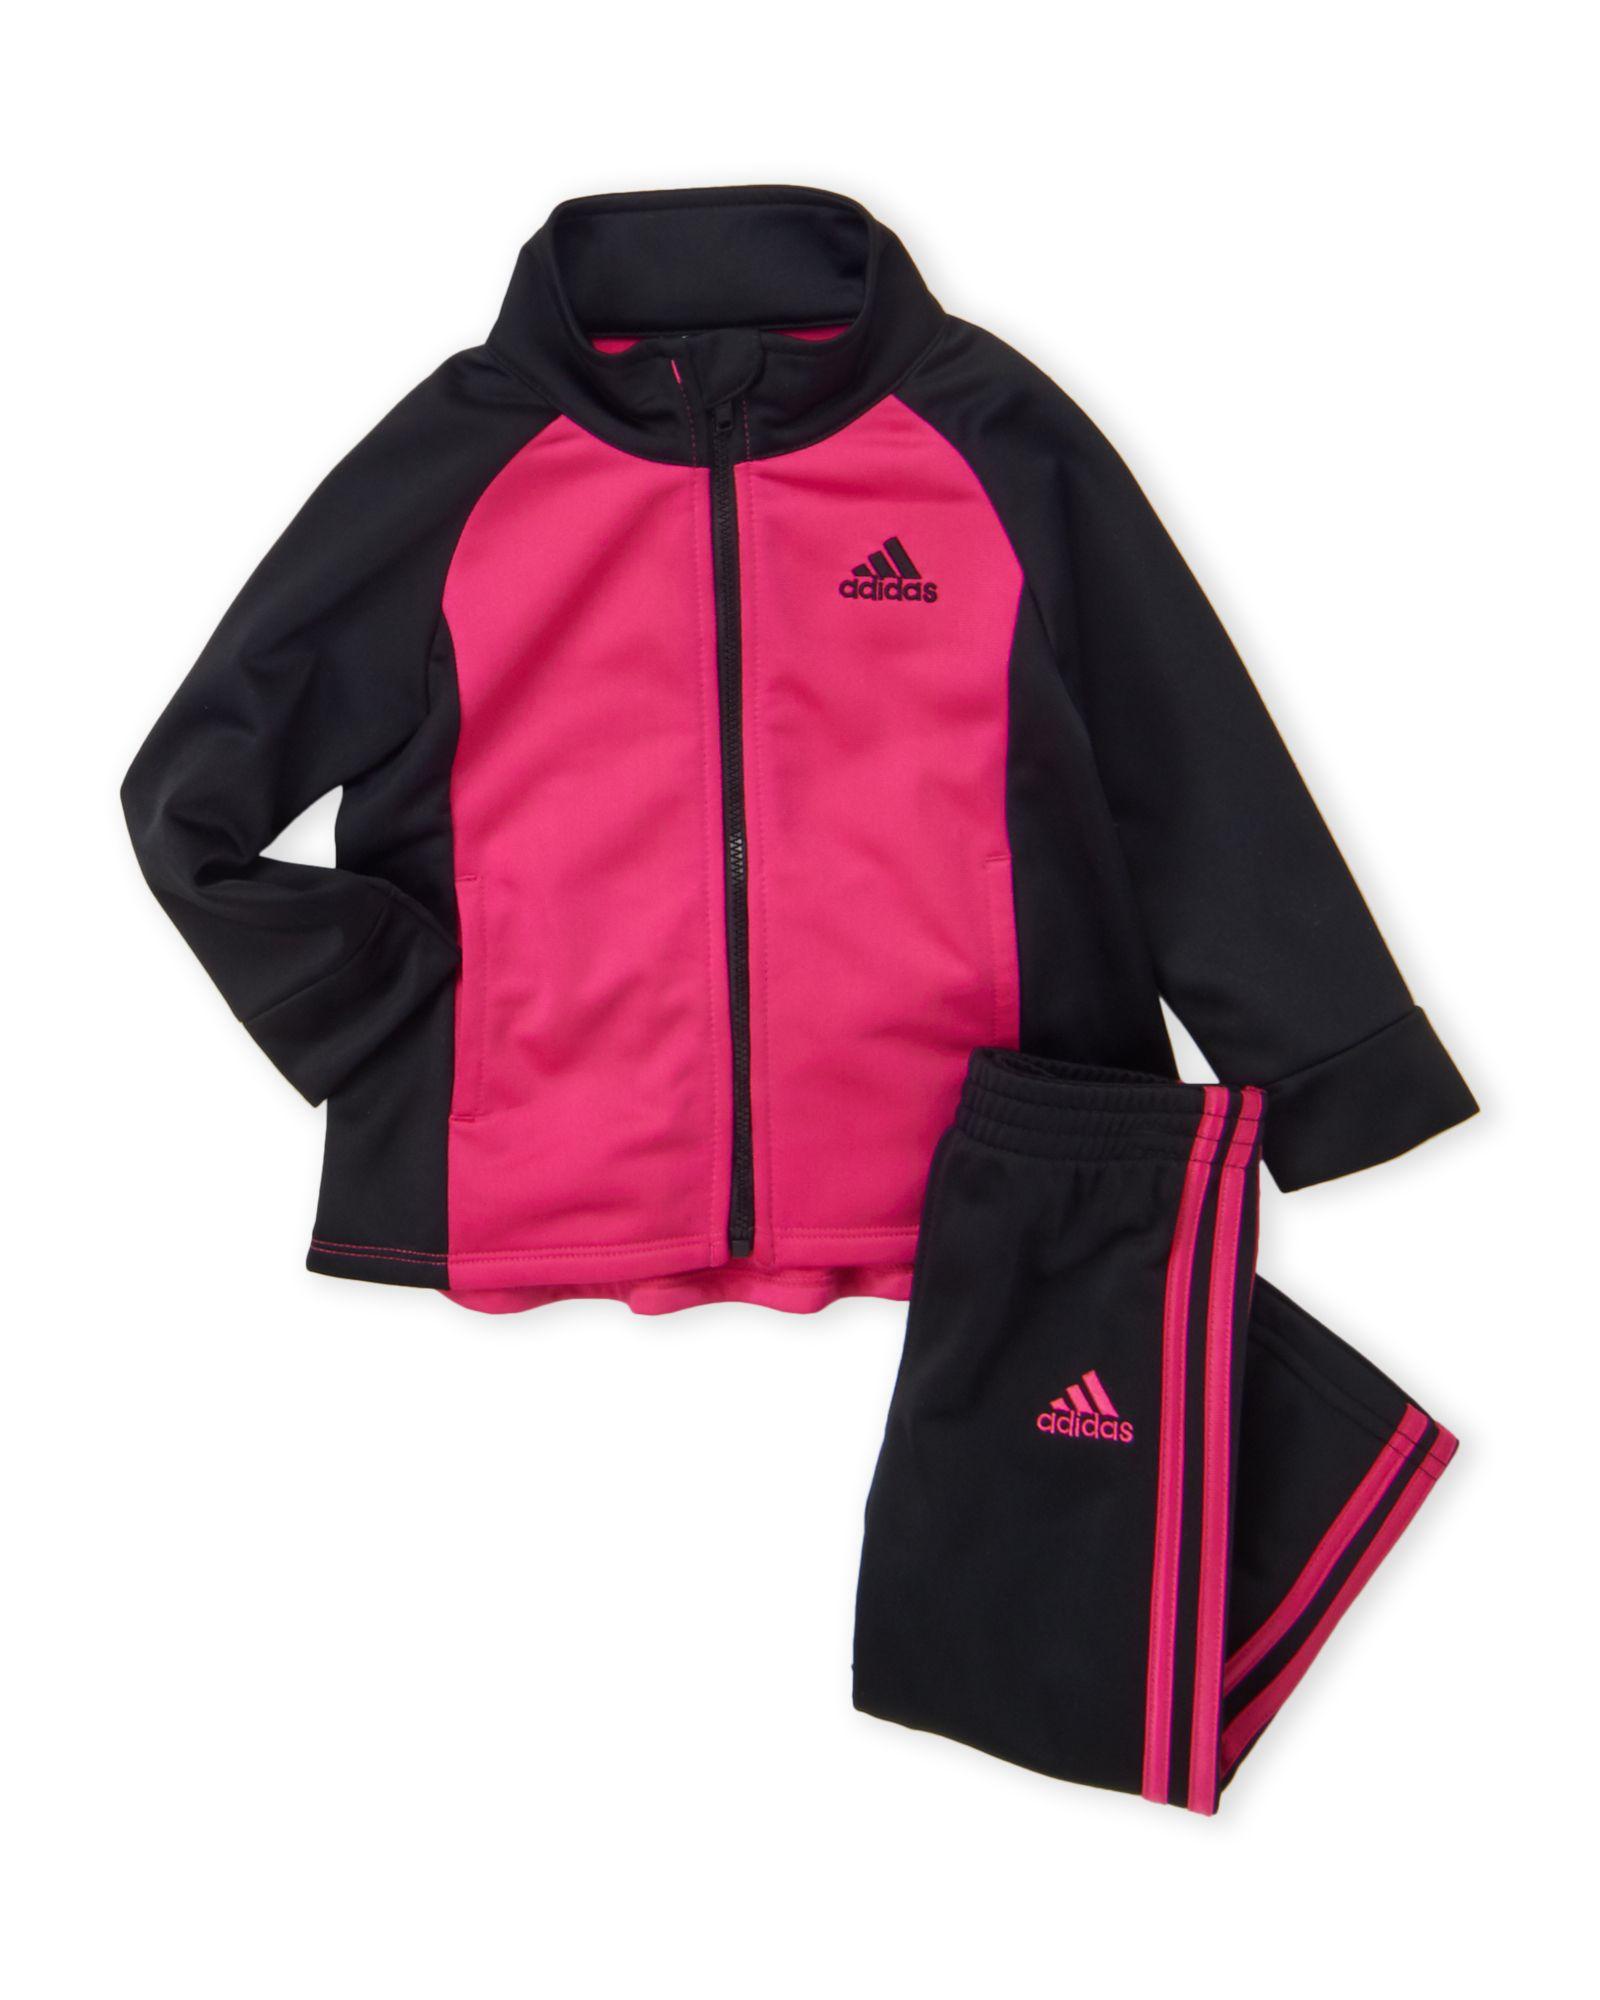 baabd72d6 Adidas (Infant Girls) Two-Piece Track Jacket & Tricot Pants Set ...